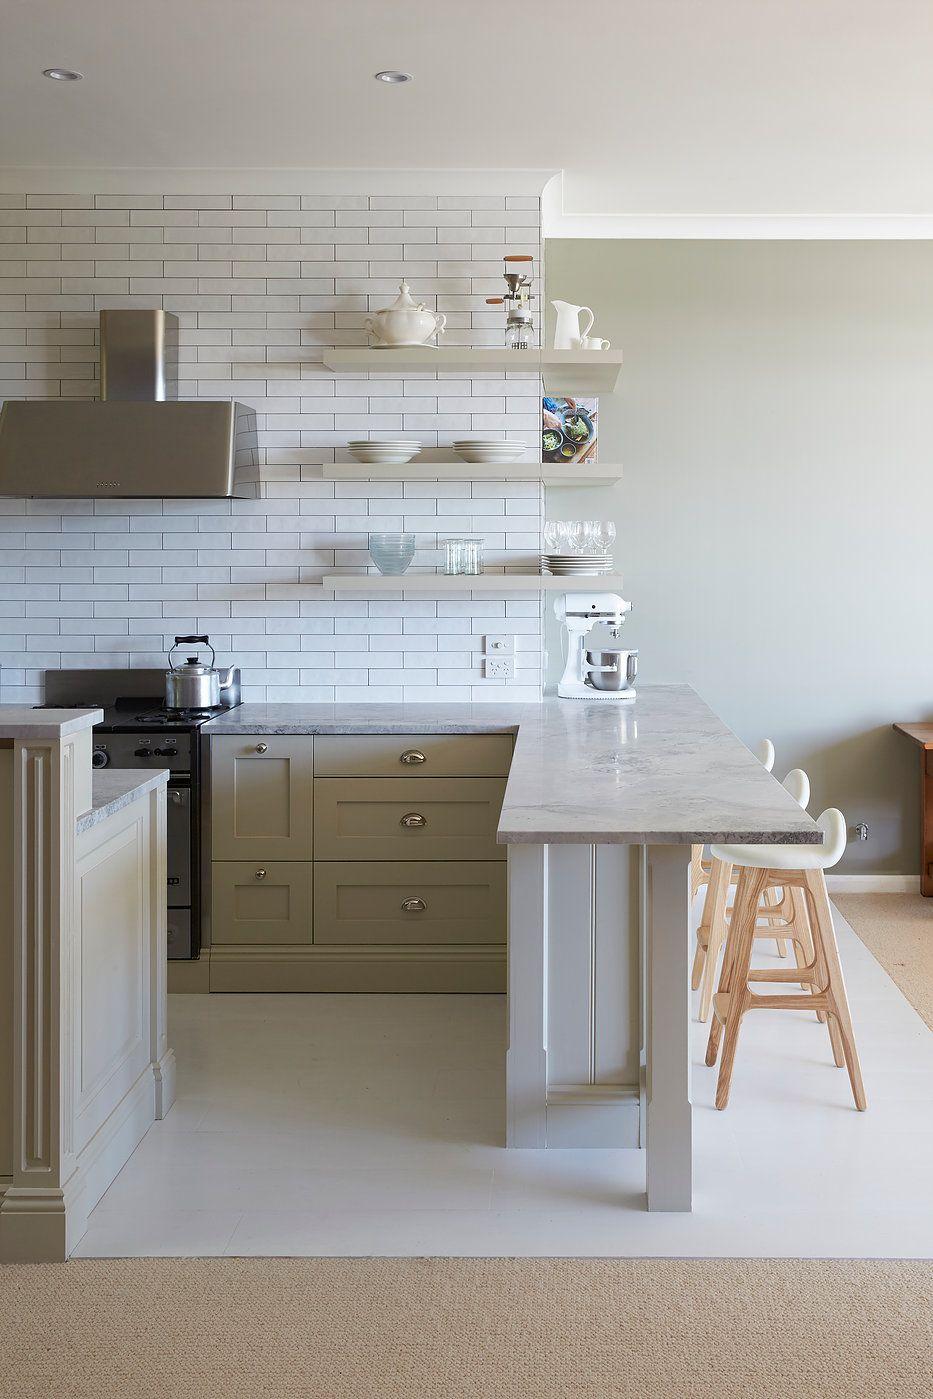 Provincial Kitchens | Bronte Road